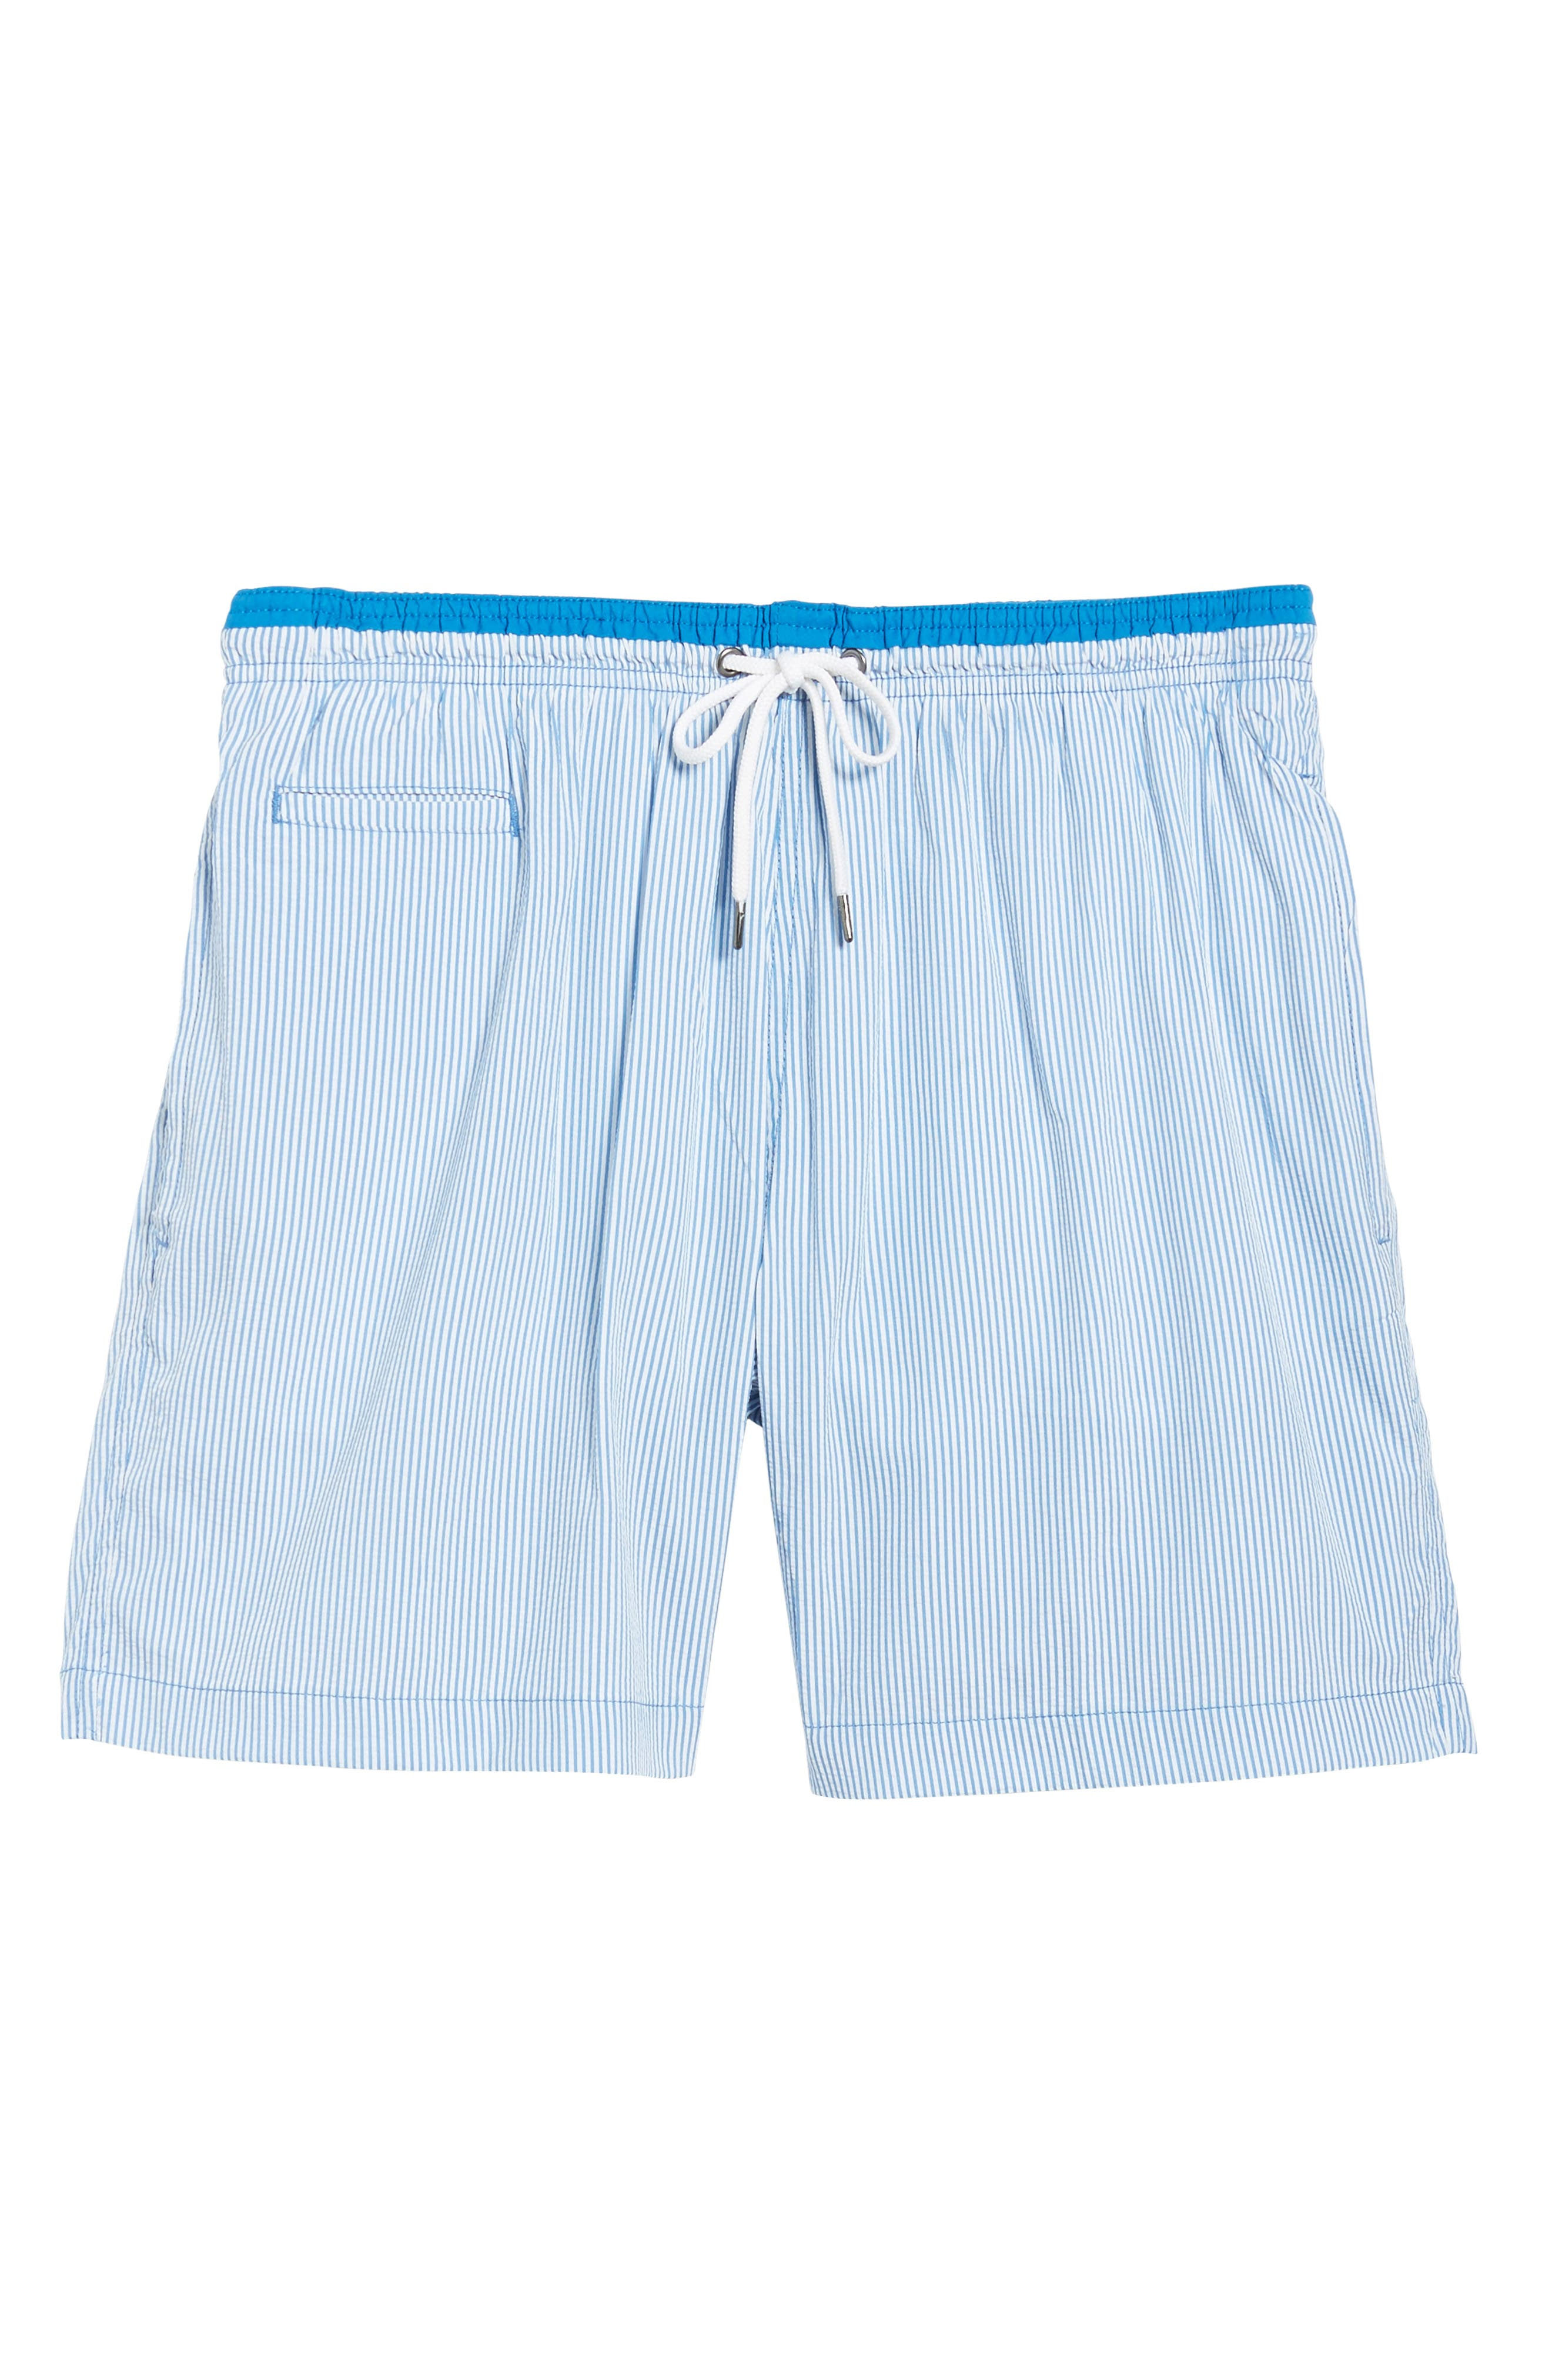 San O Stripe Swim Trunks,                             Alternate thumbnail 6, color,                             Nautical Blue/ White